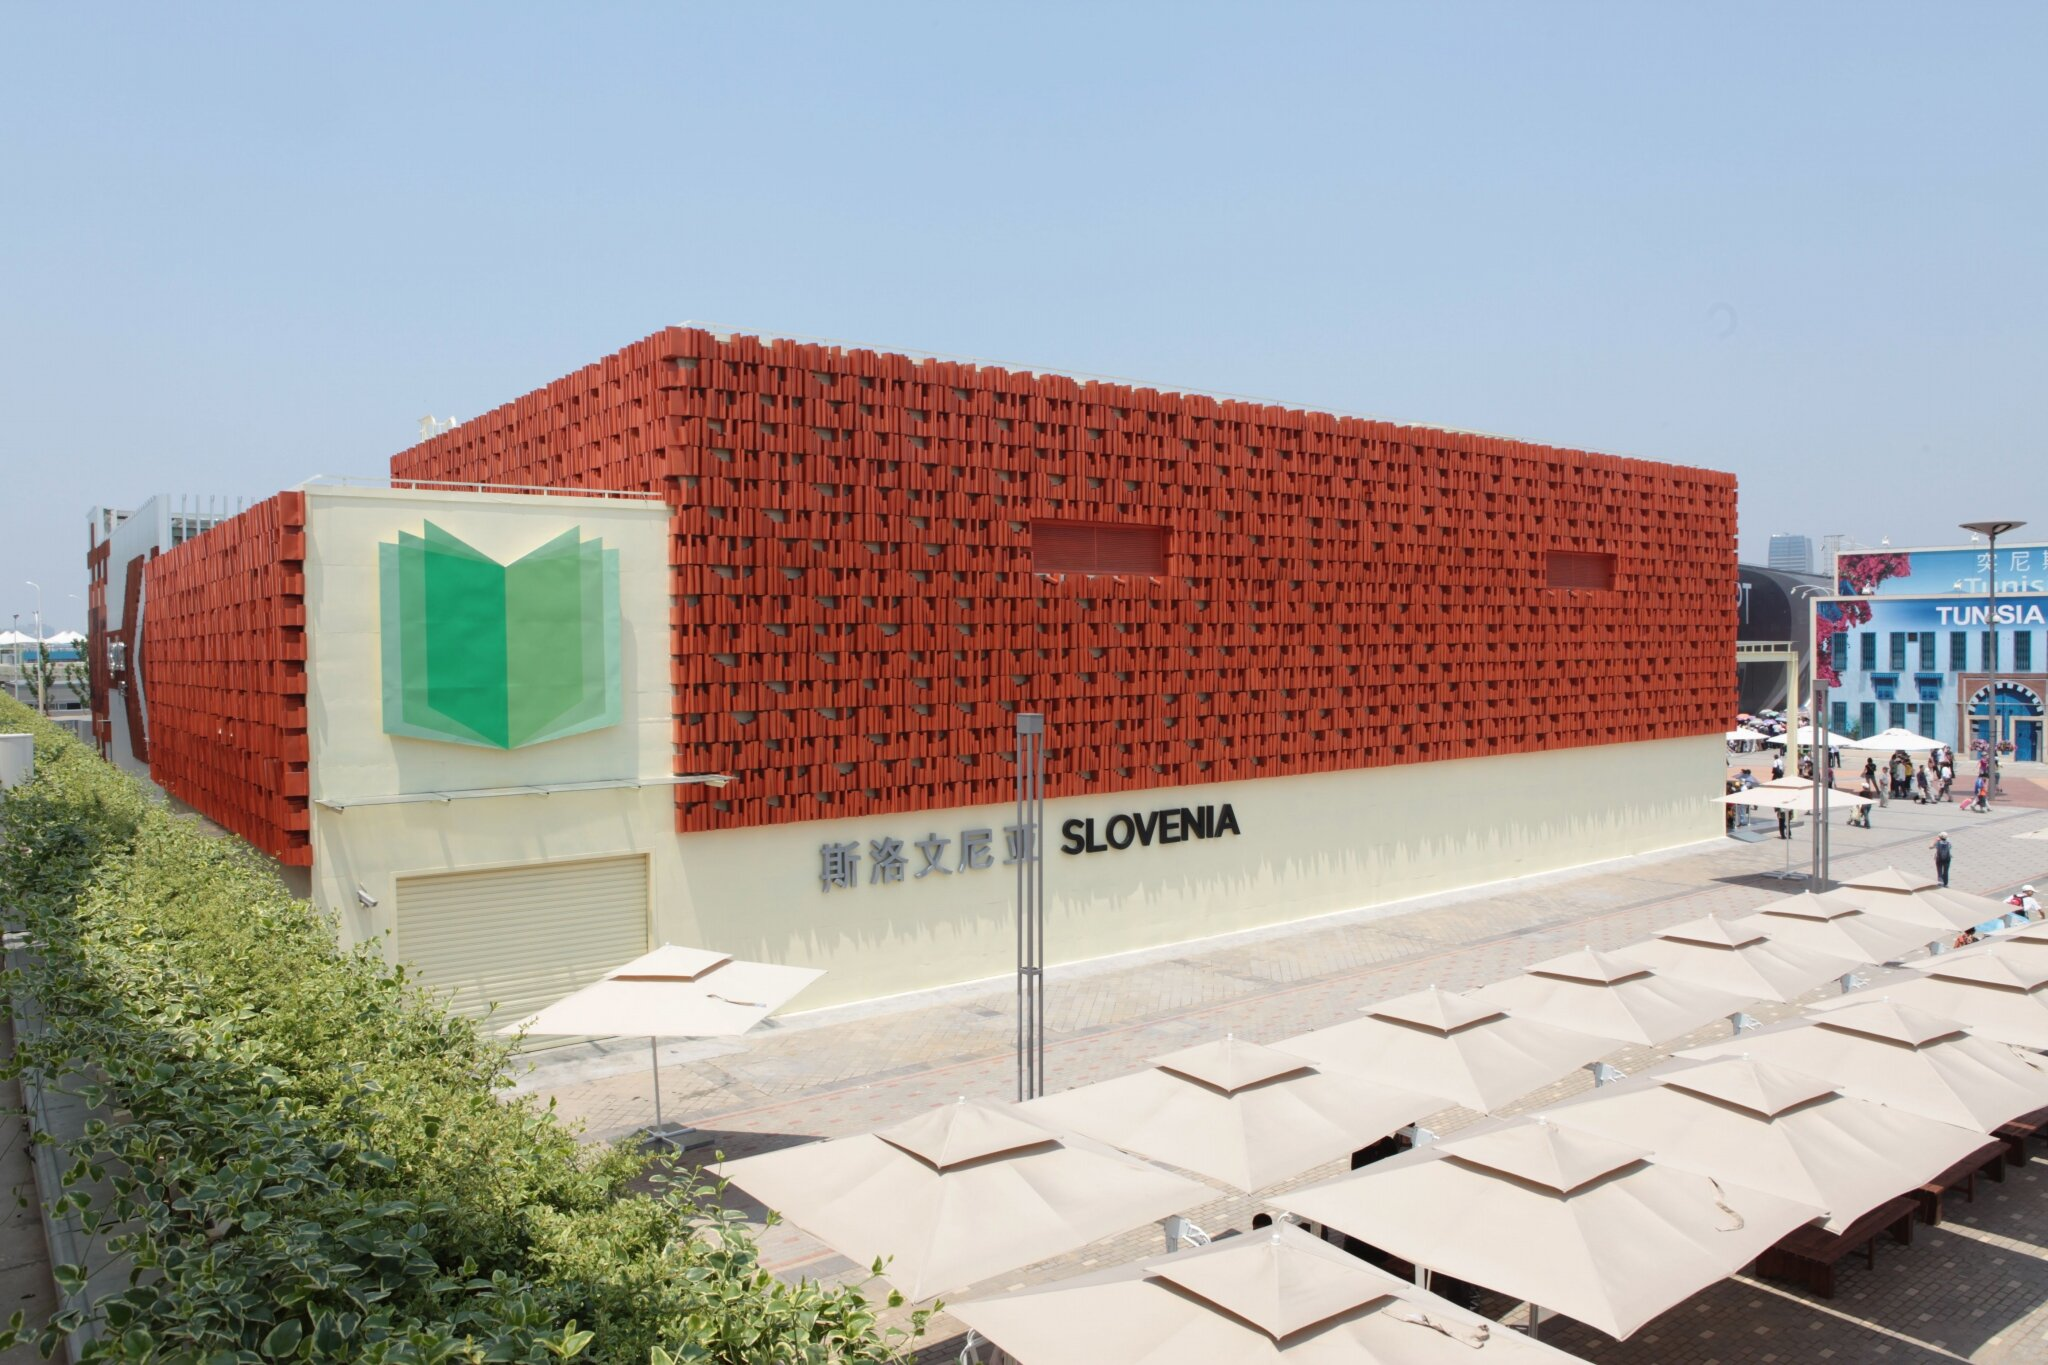 Pavillon de la Slovenie